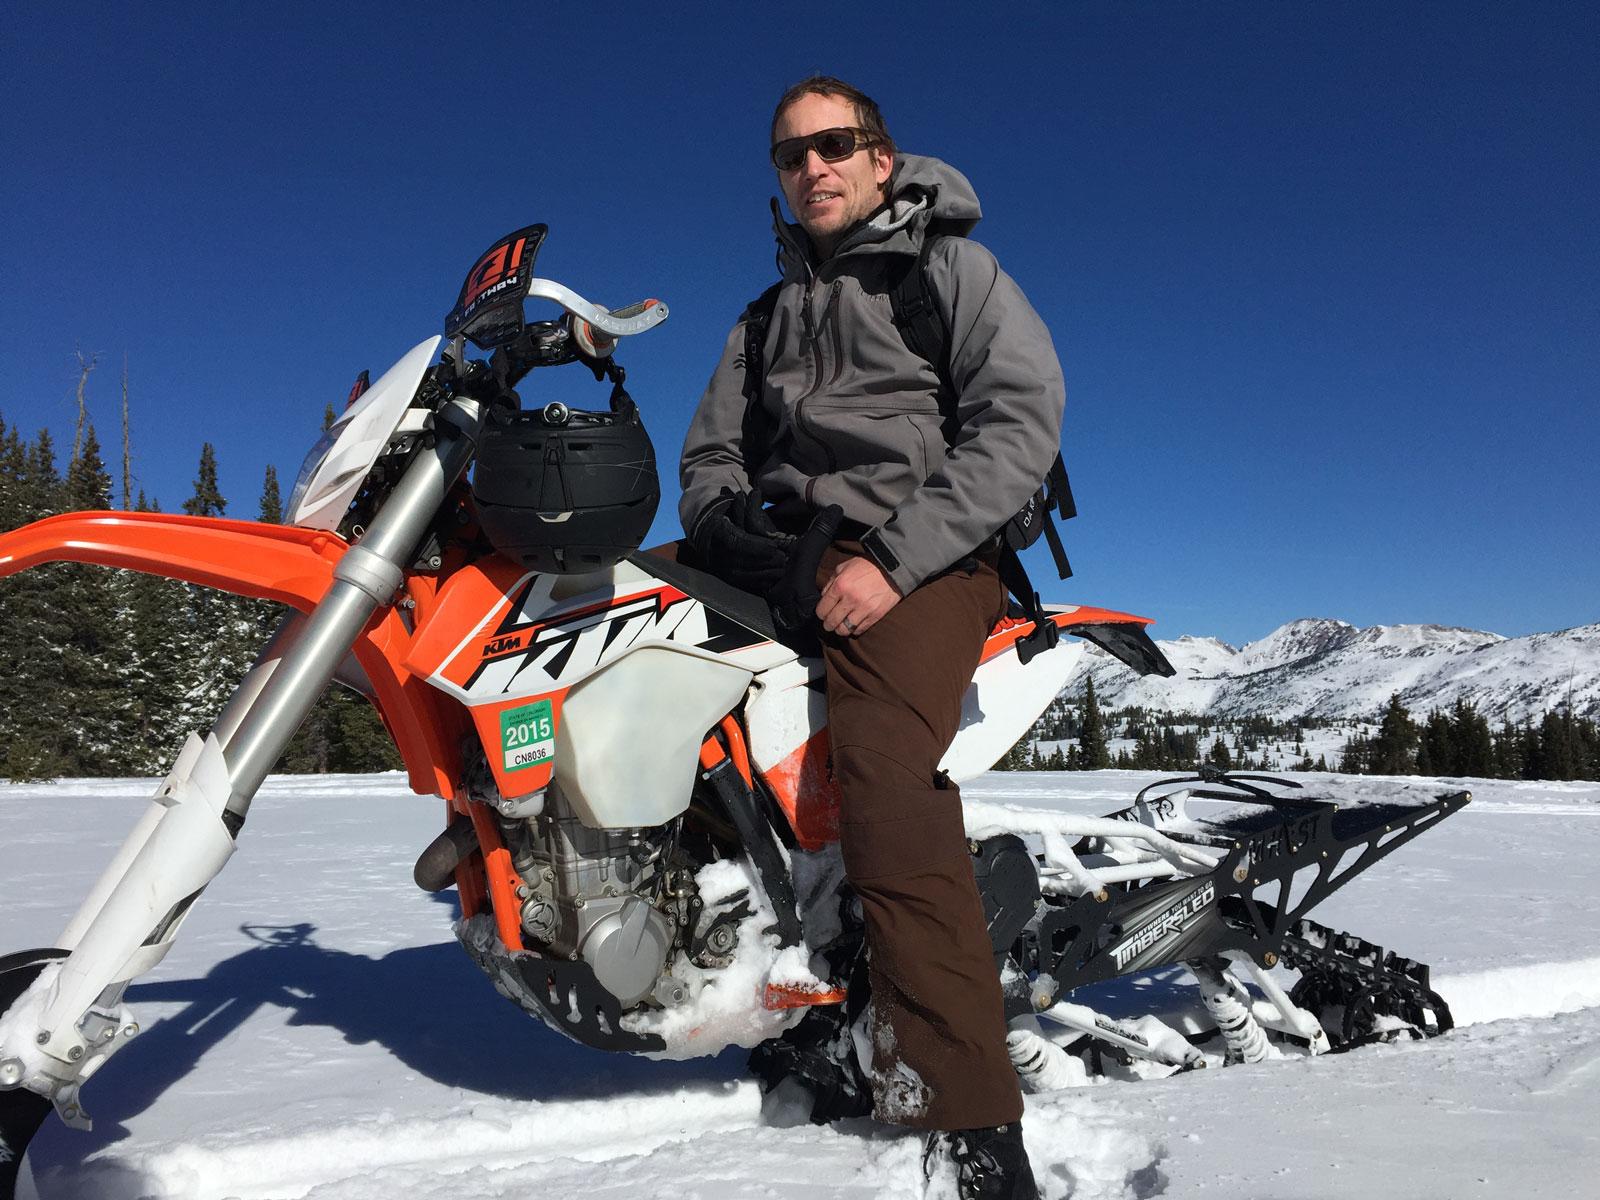 timbersled review colorado rocky mountain adventure rentals vail pass colorado